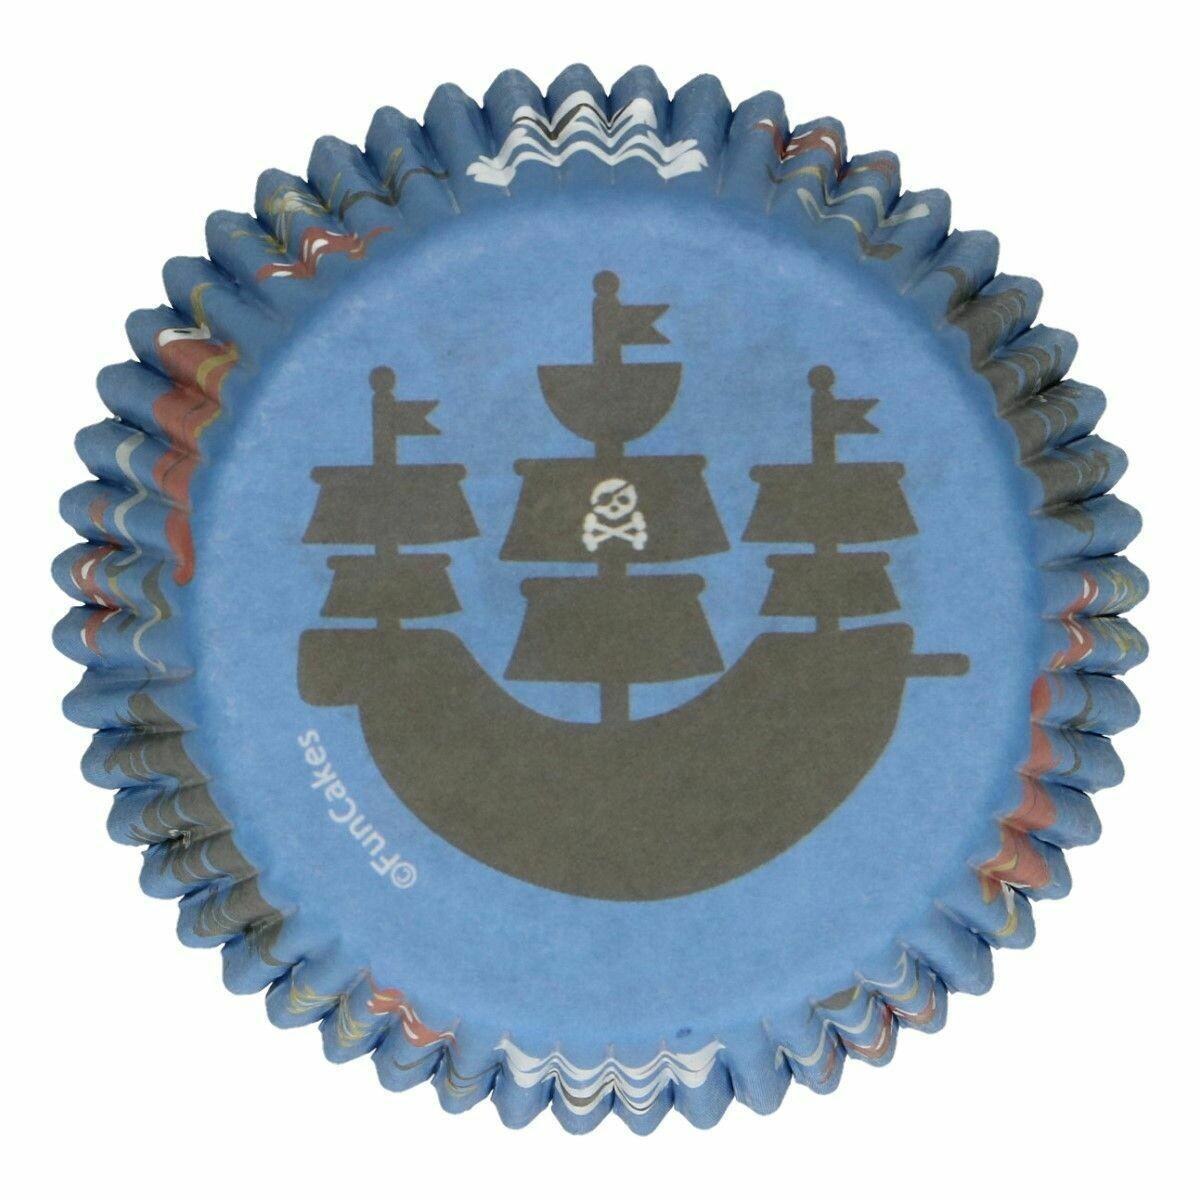 SALE!!! FunCakes Cupcake Cases -PIRATES -Θήκες Ψησίματος 48 τεμ - Πειρατικό θέμα